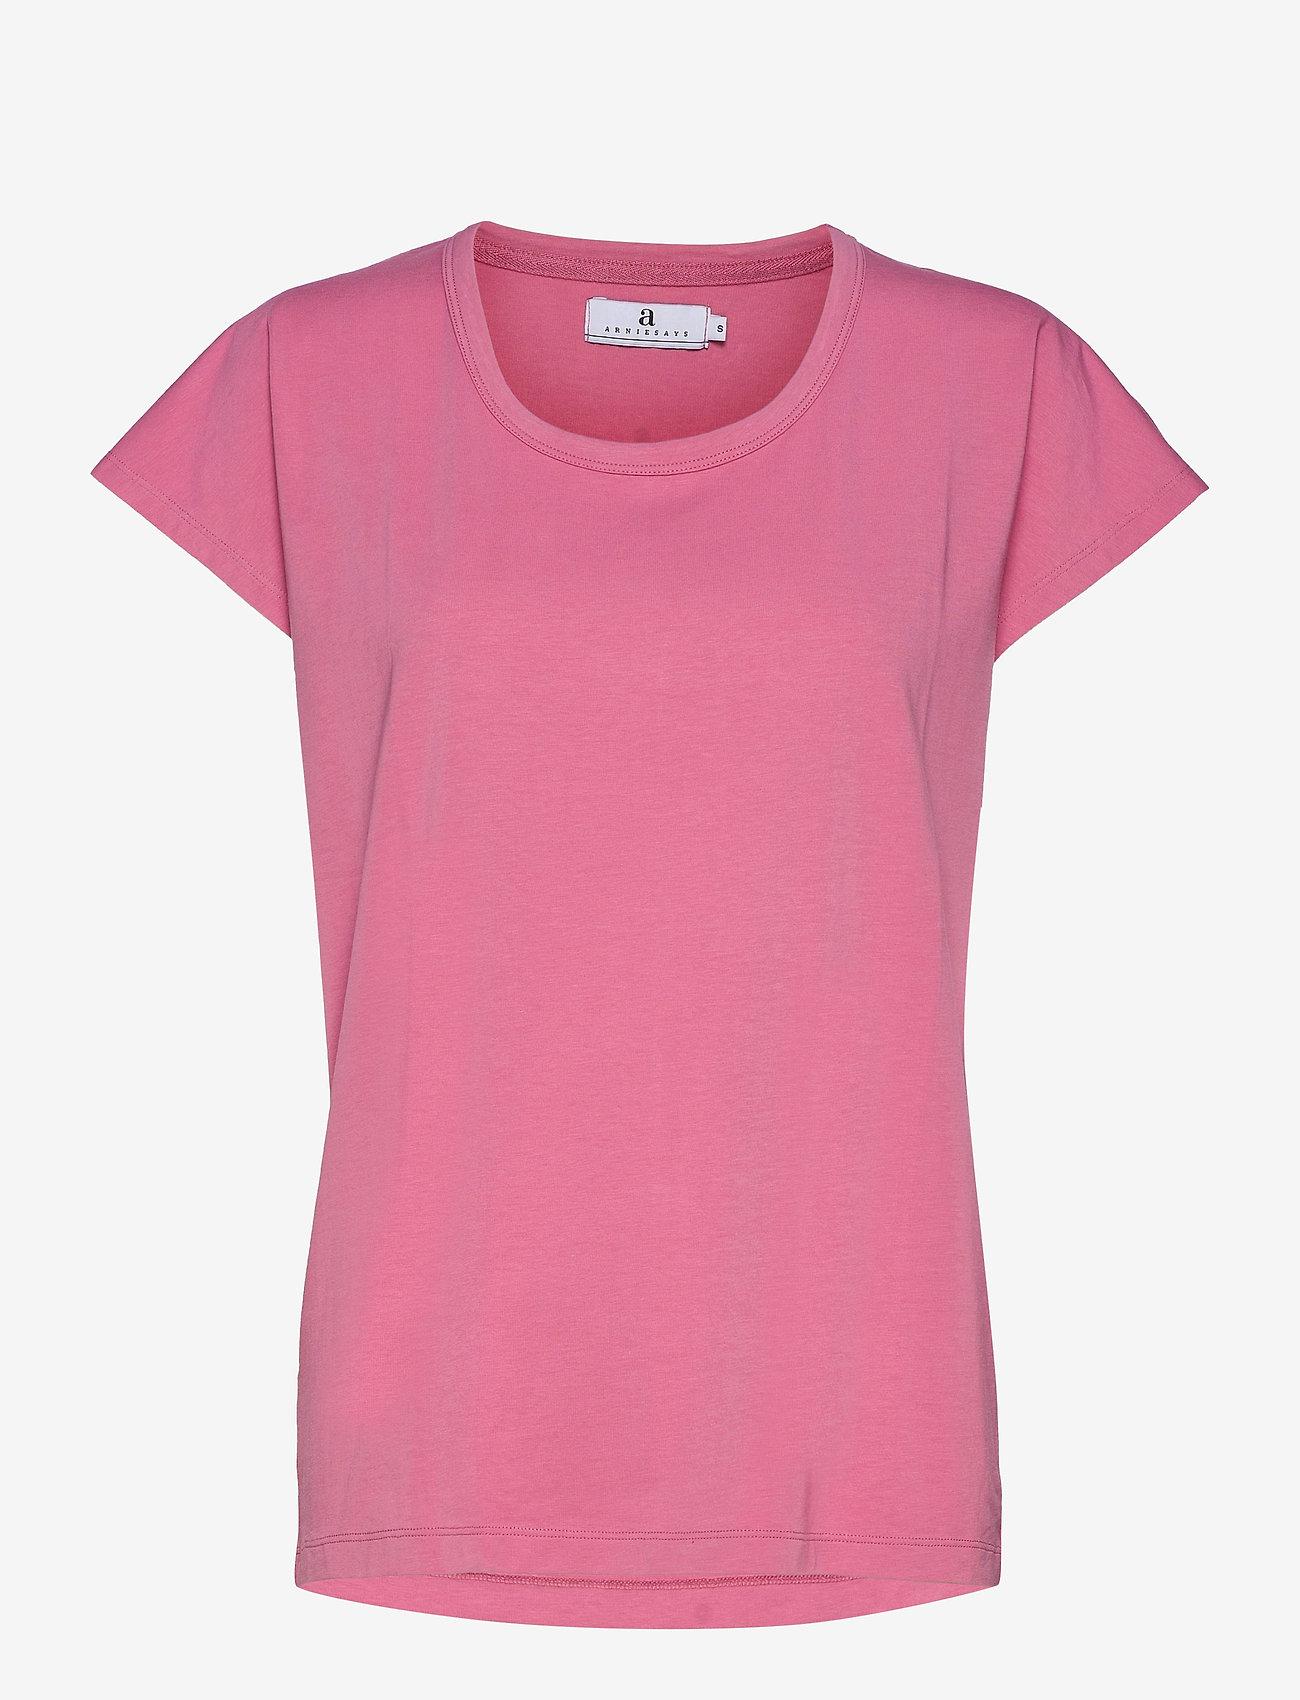 Arnie Says - Hadley Cotton - t-shirt & tops - pink - 0